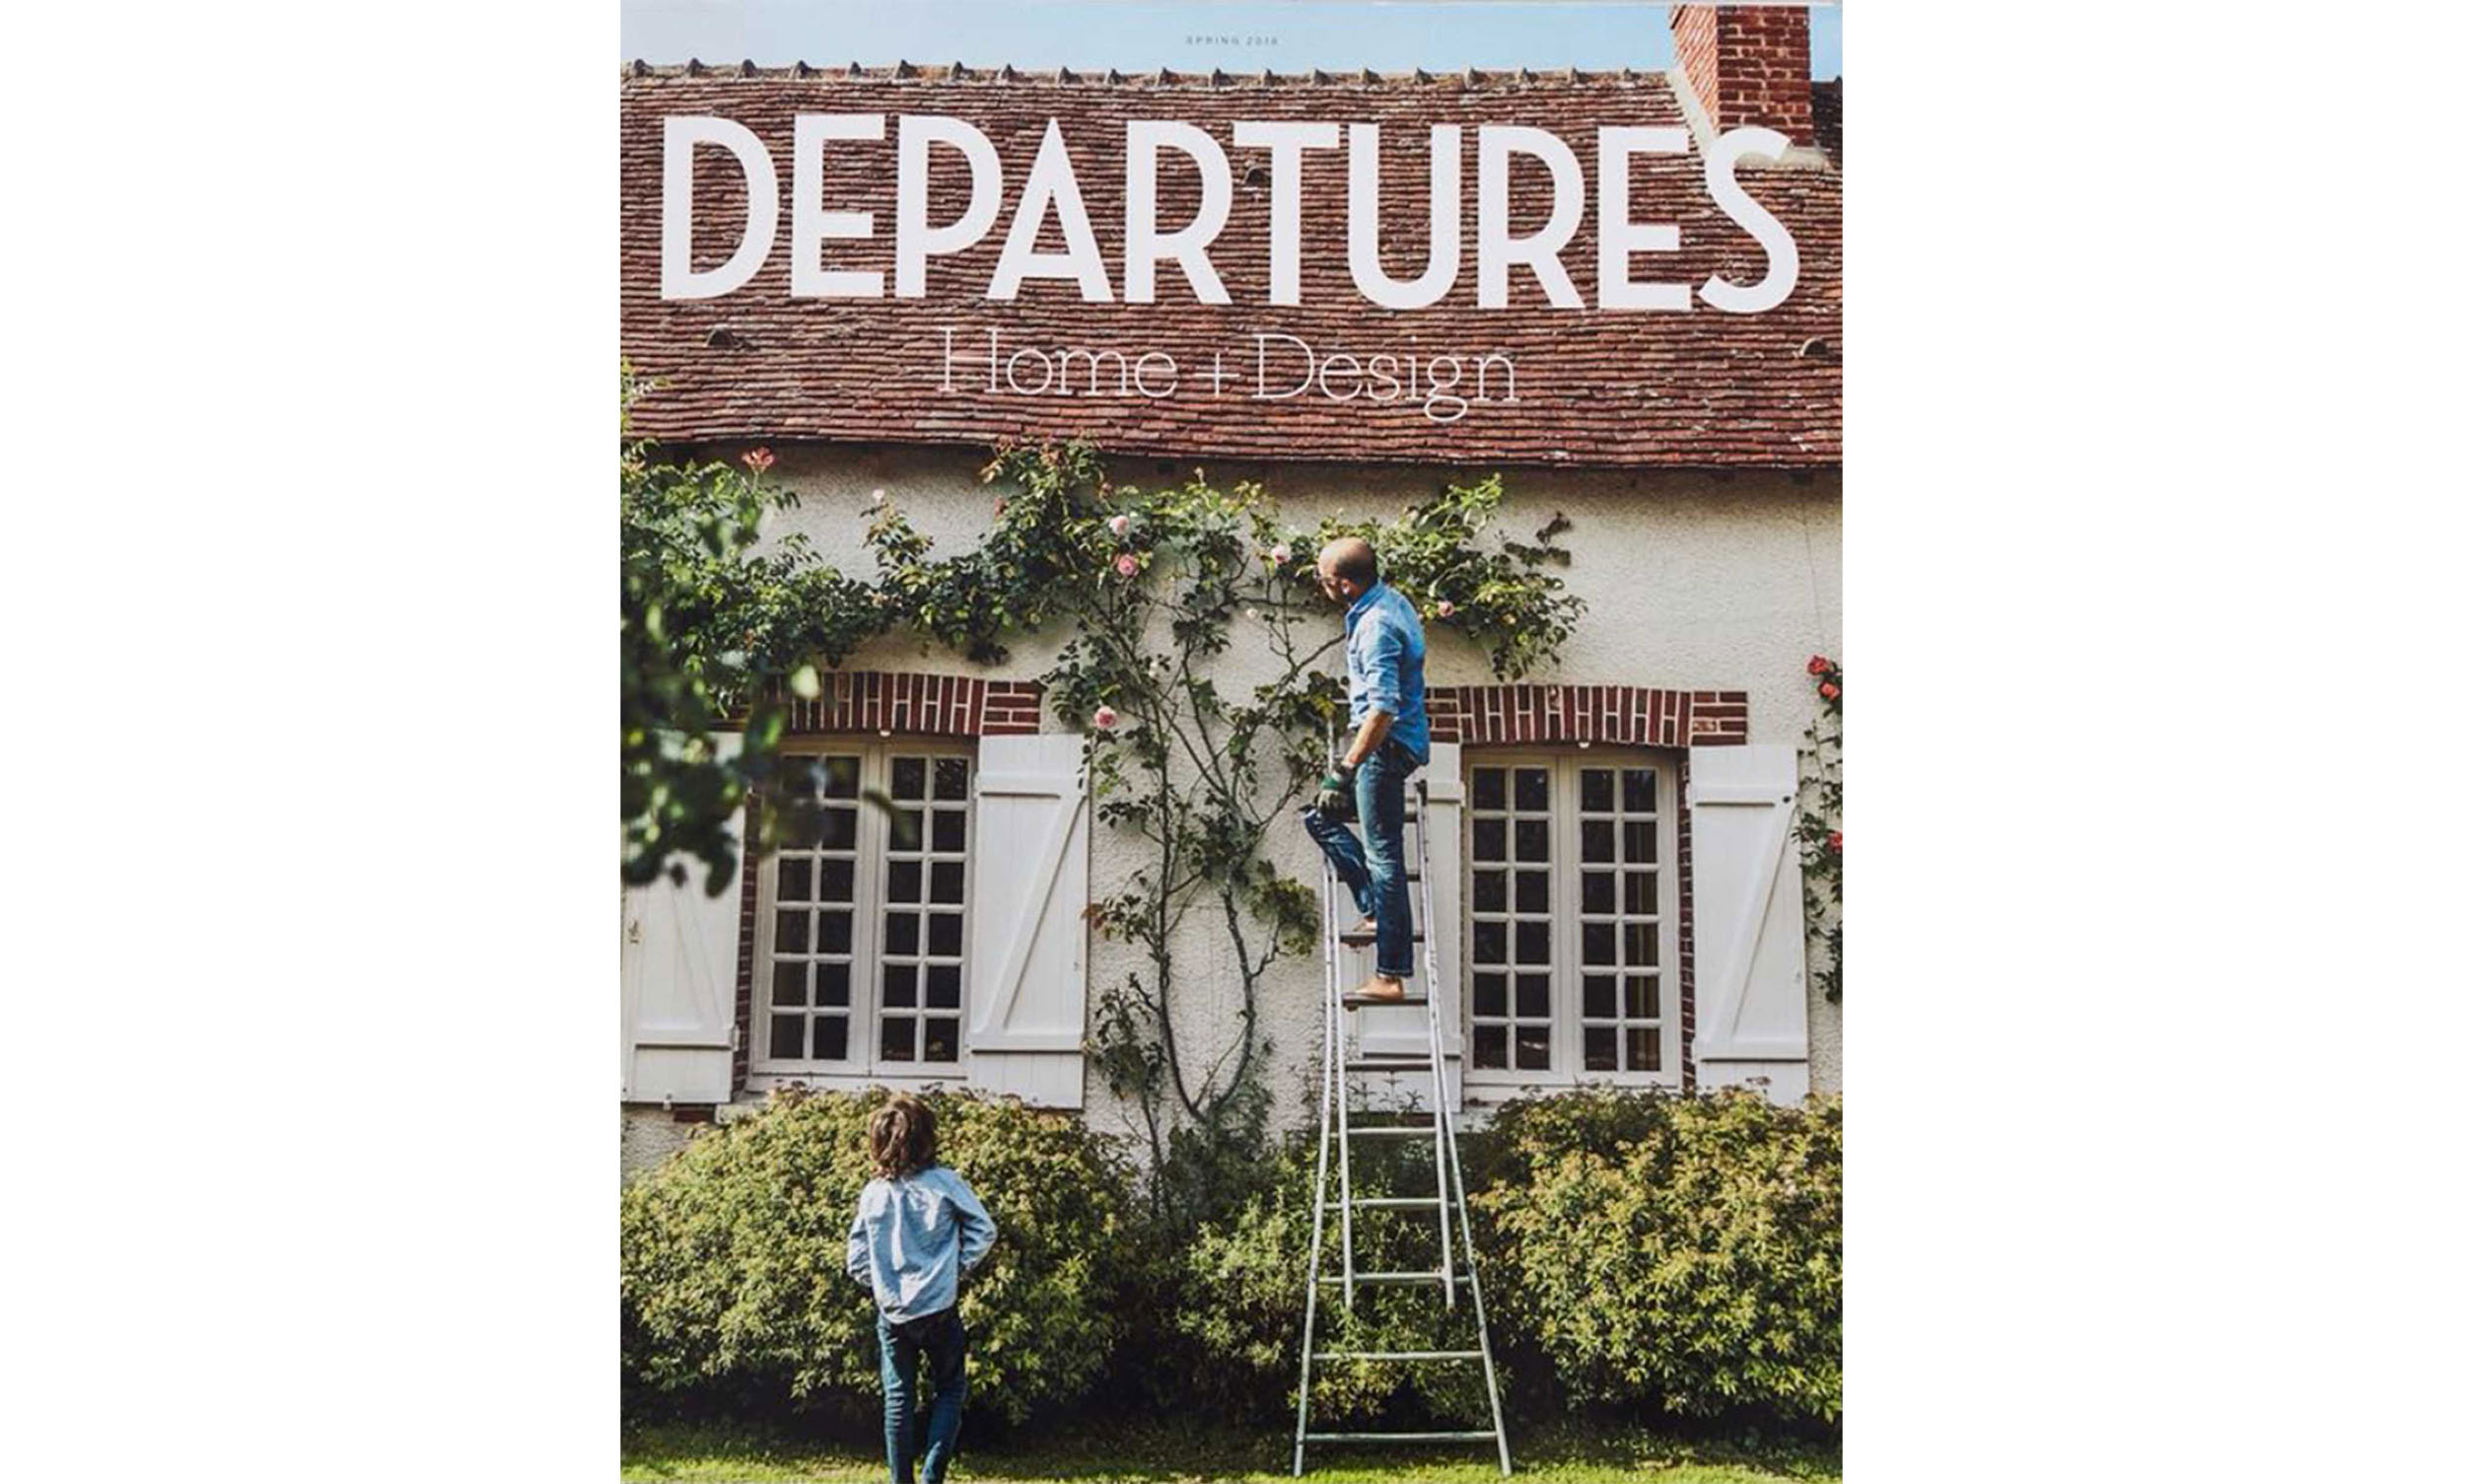 departures-magazine-maximilian-jenquel-bali-tommaso-riva-lisa-scappin-interiors-bamboo (1 of 4).jpg